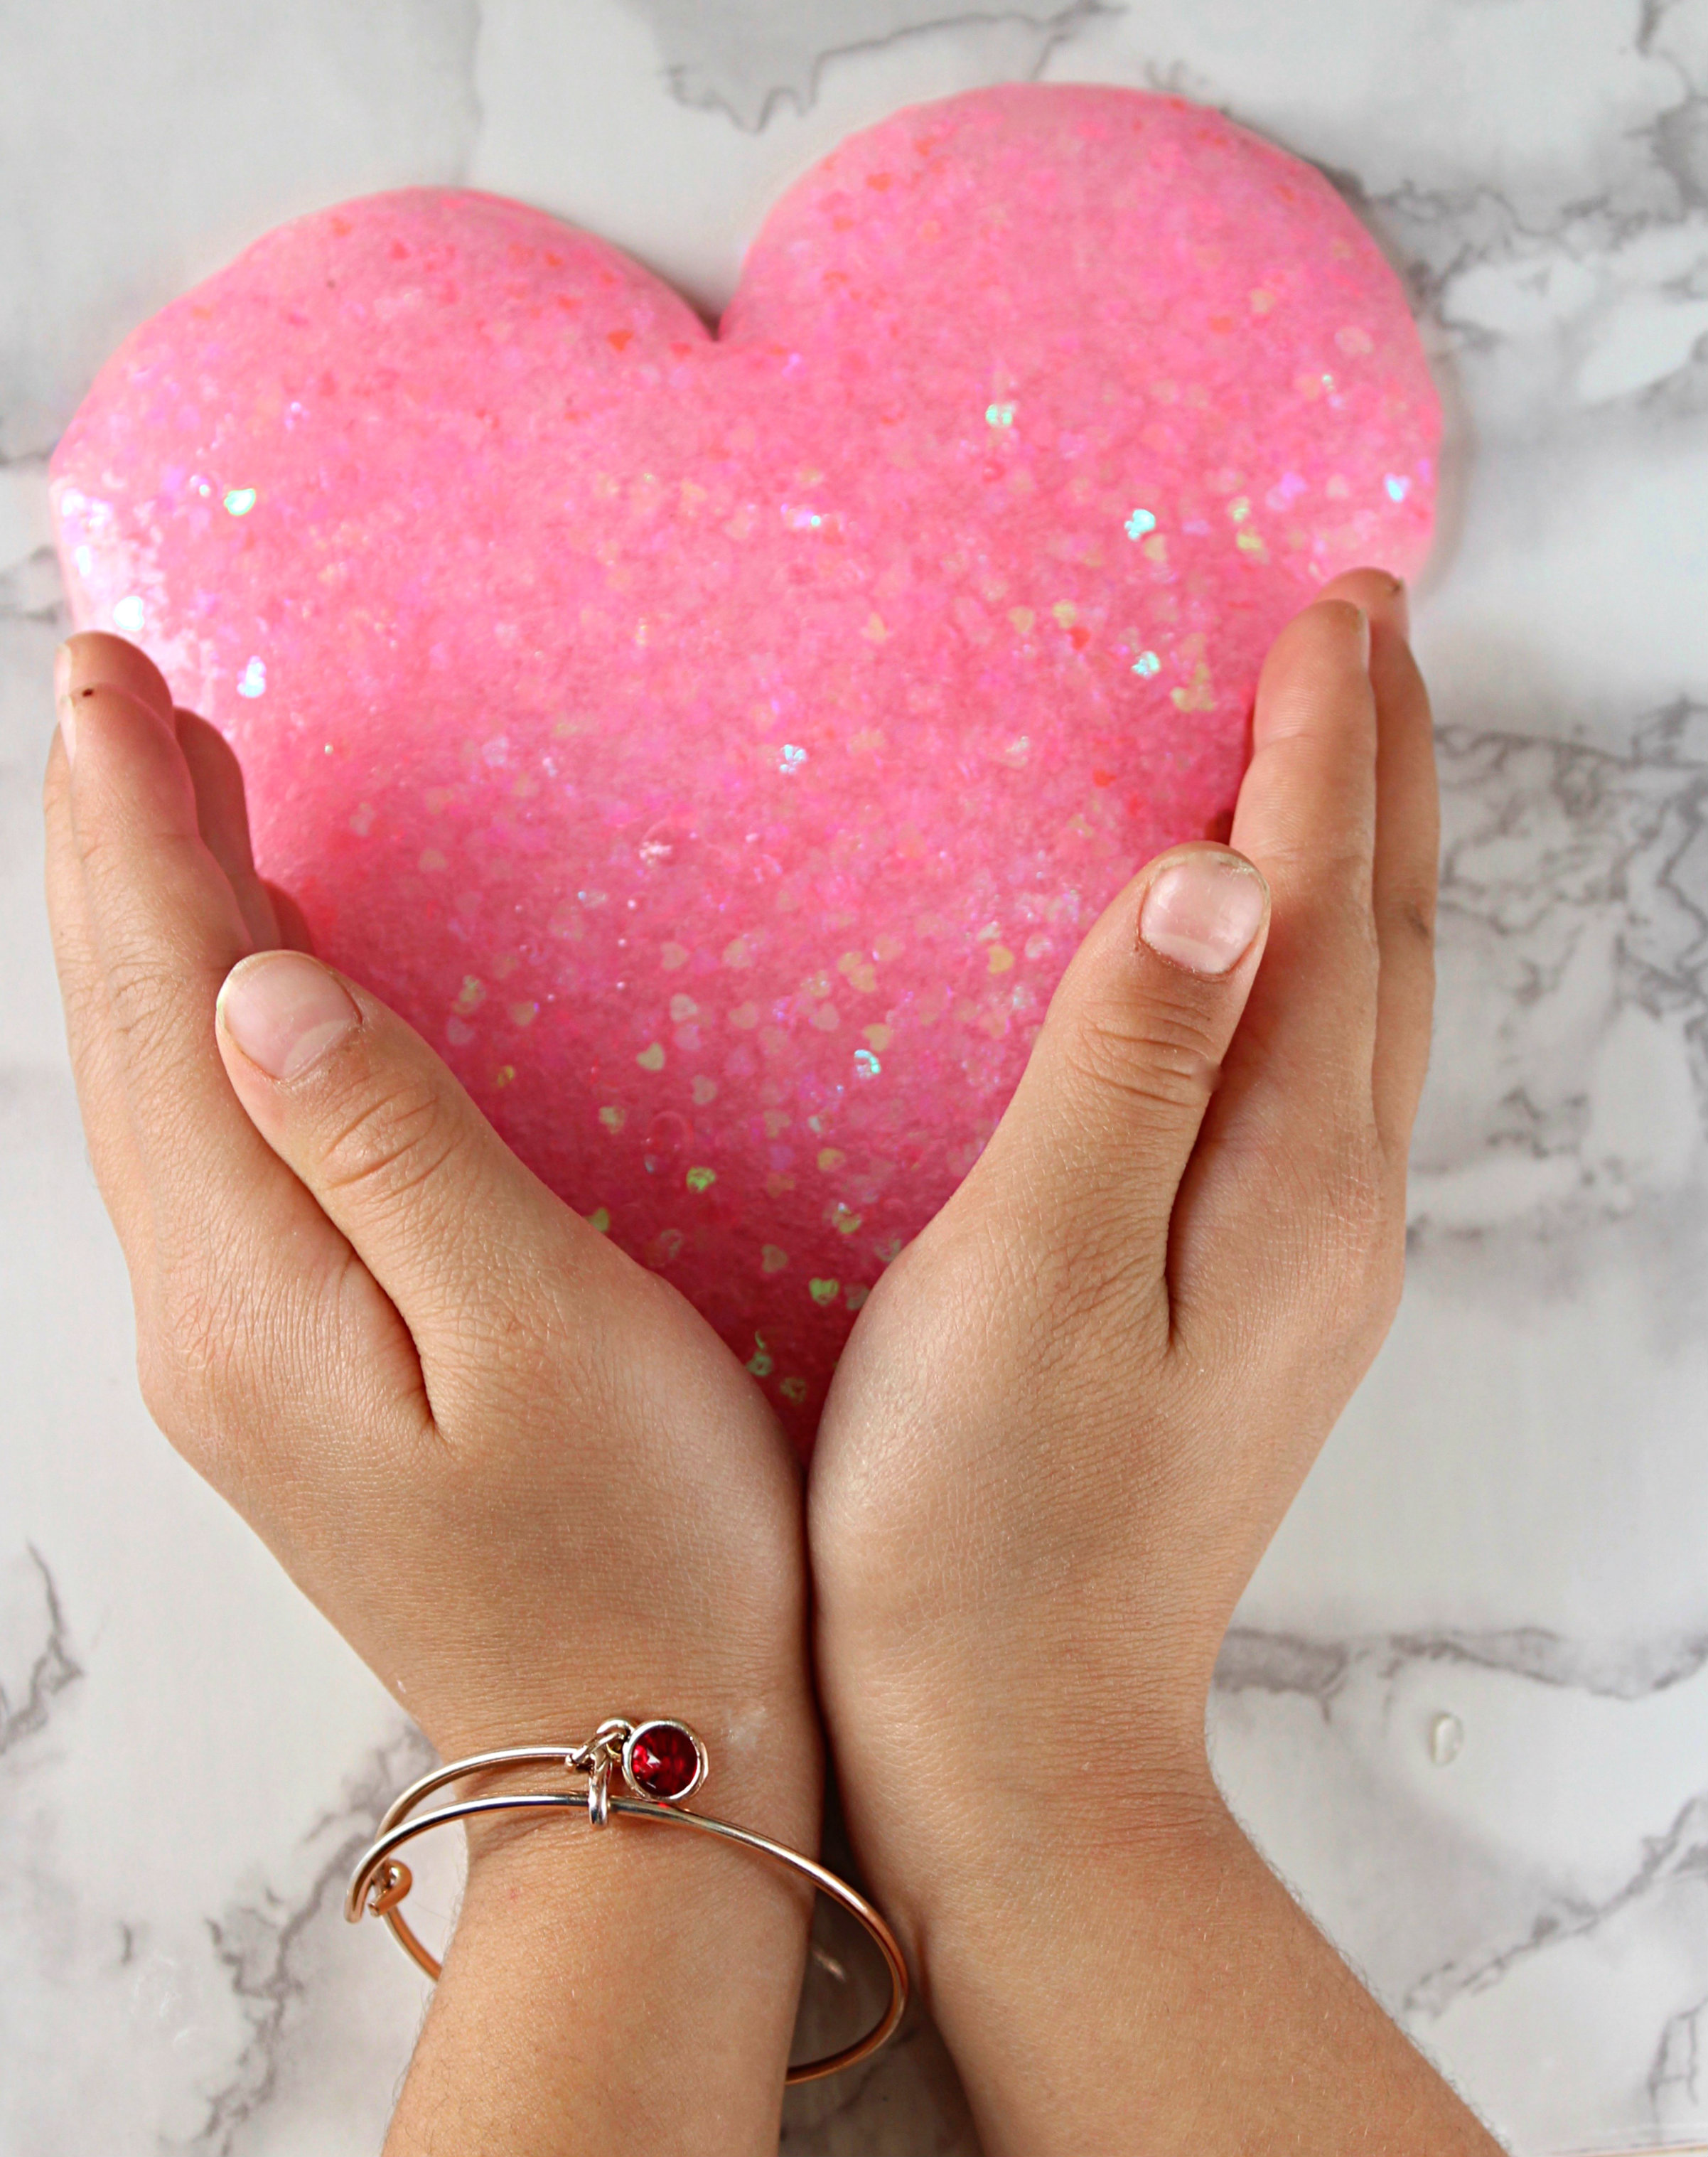 Pink Heart Shaped Clear Glitter Valentine Slime